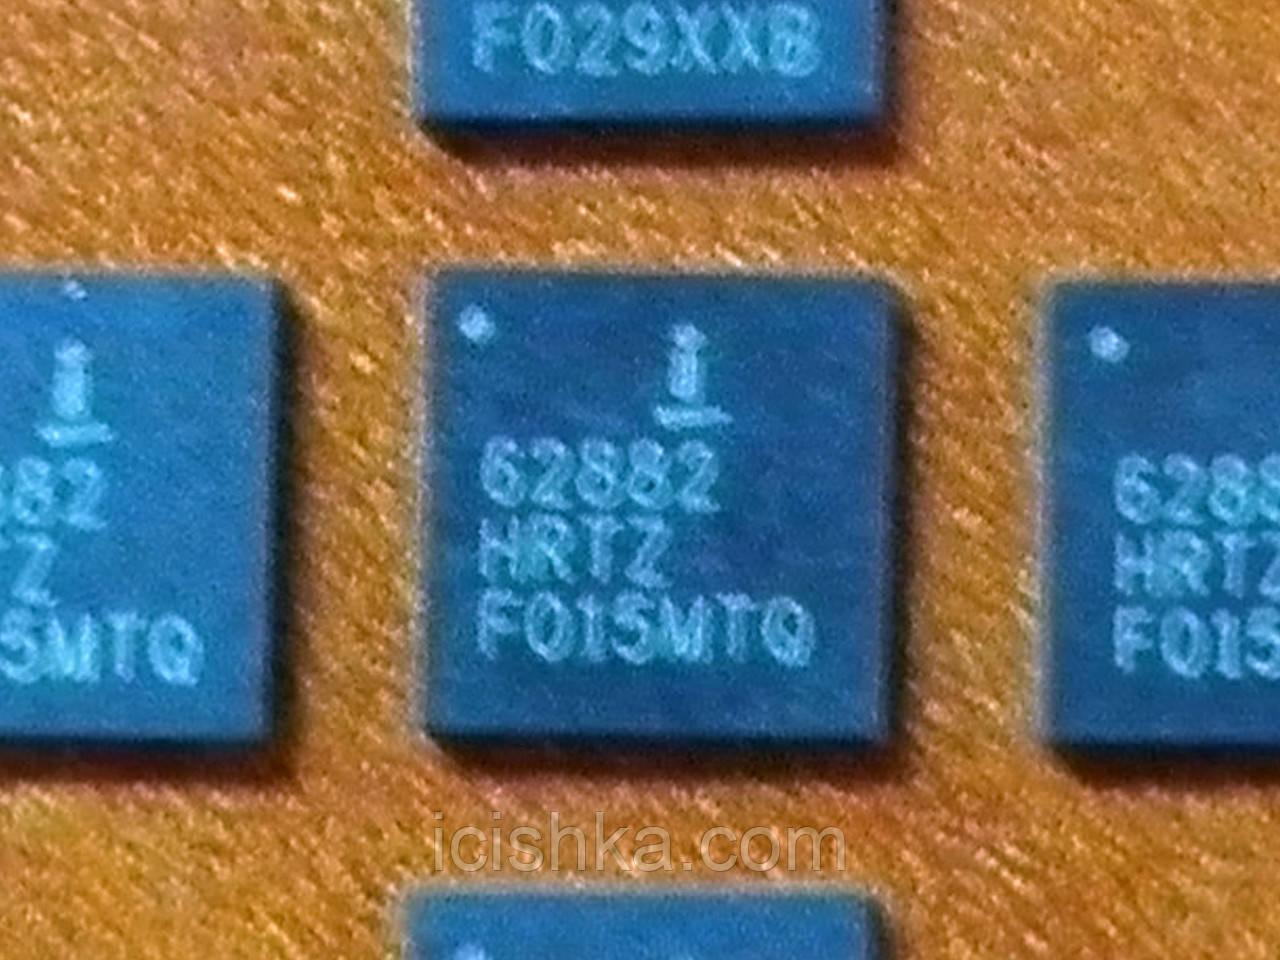 ISL62882 / ISL62882HRTZ контроллер питания IMVP-6.5